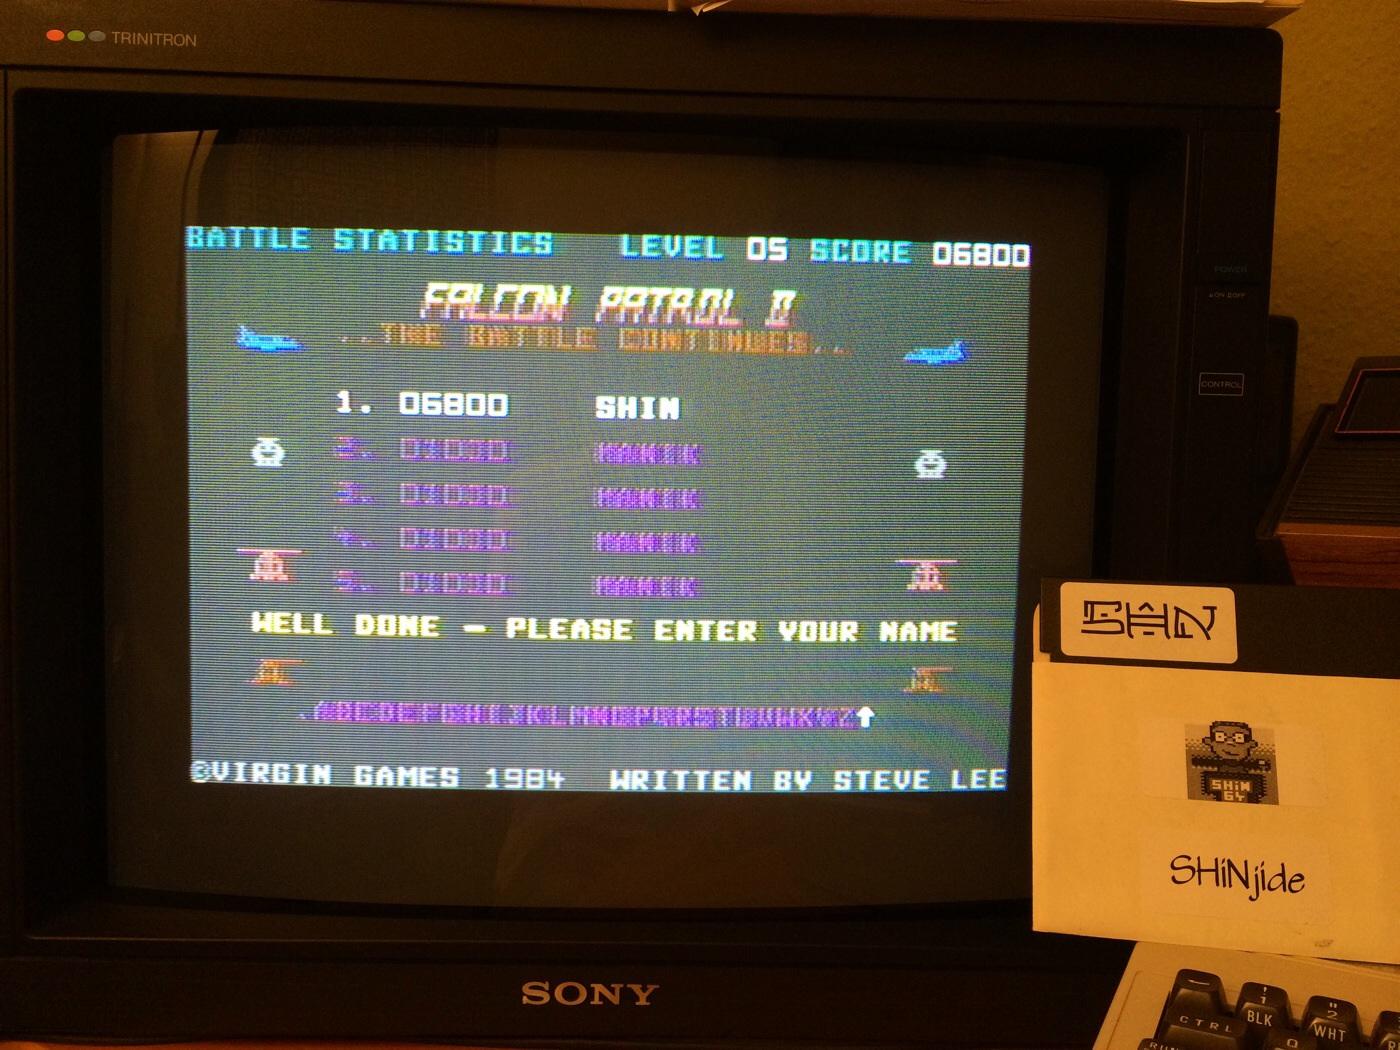 SHiNjide: Falcon Patrol II (Commodore 64) 6,800 points on 2014-08-11 14:51:47